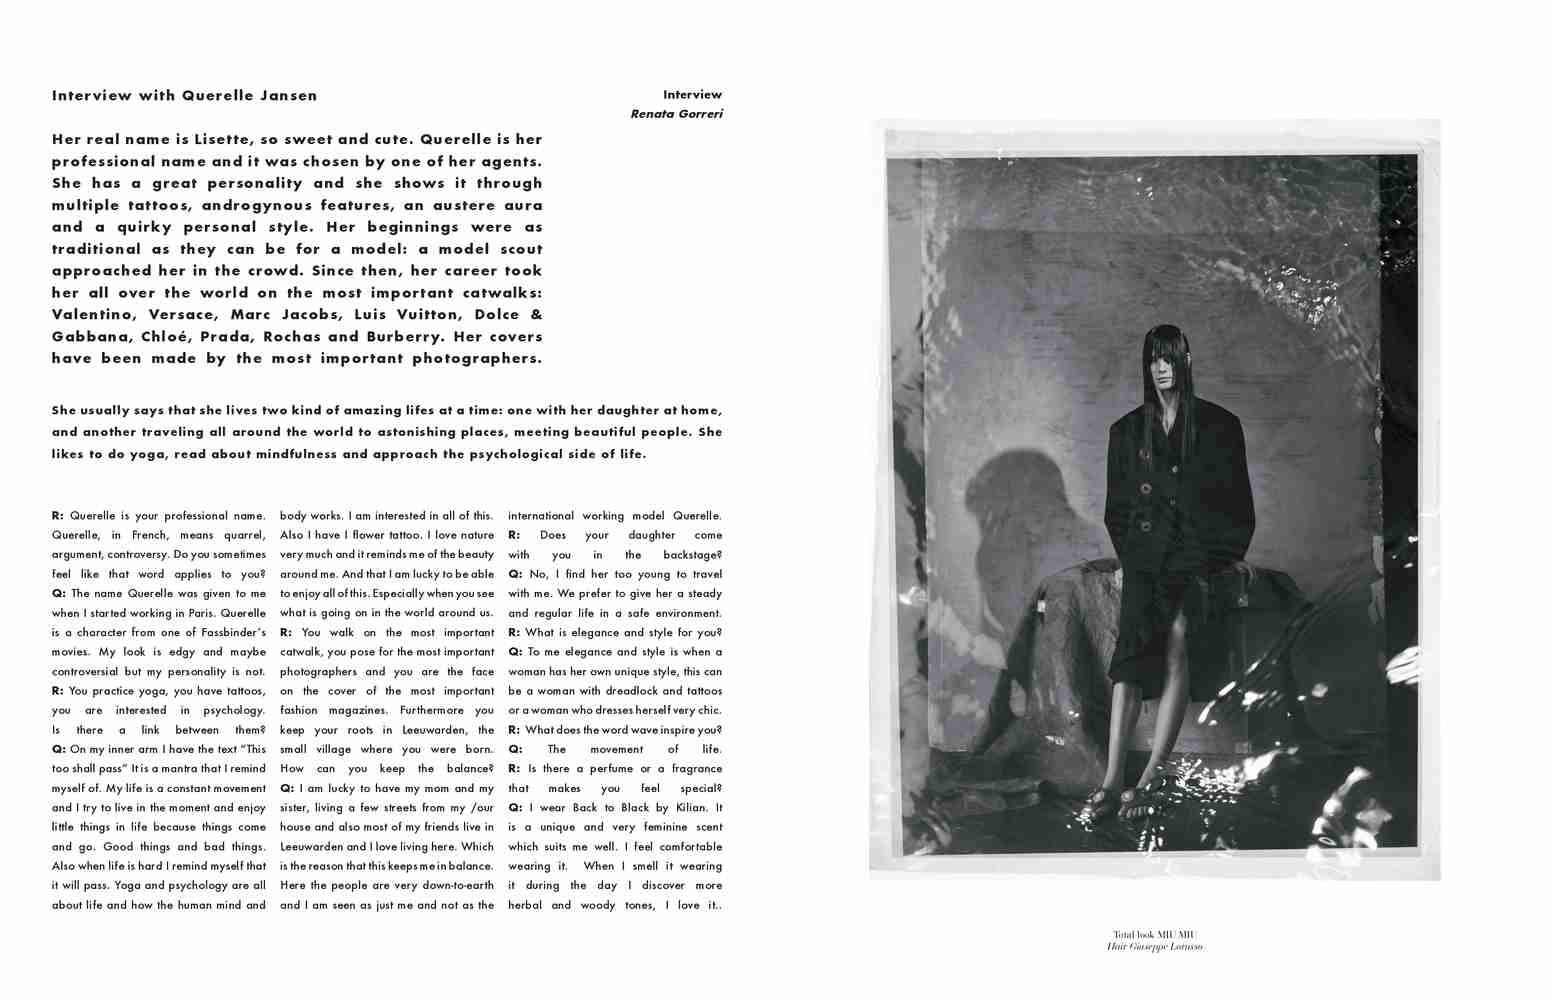 Elisabetta Cavatorta Stylist - Under Water - Joseph Cardo - Mia Le Journal